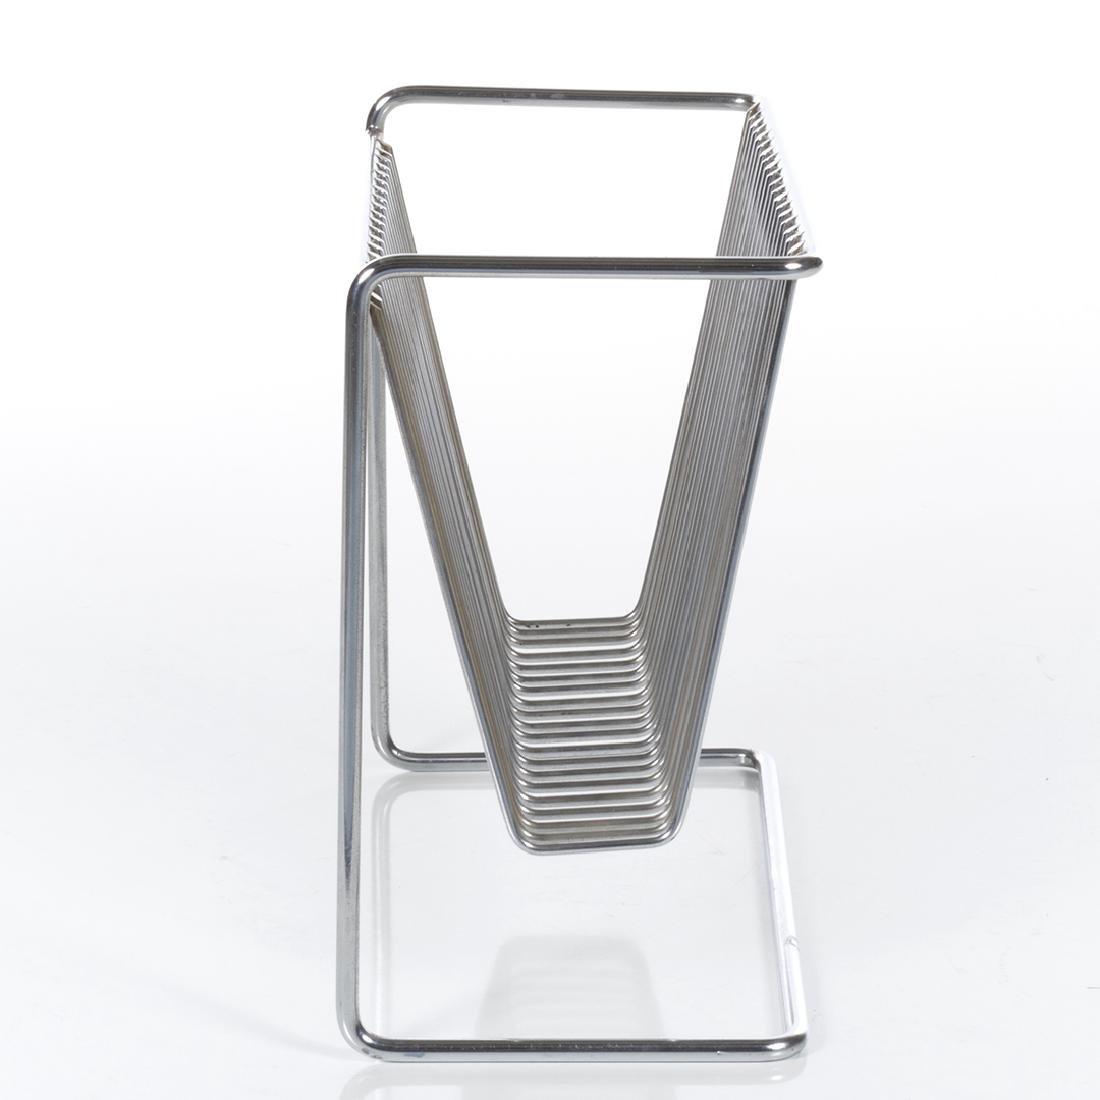 Chrome magazine holder - 2